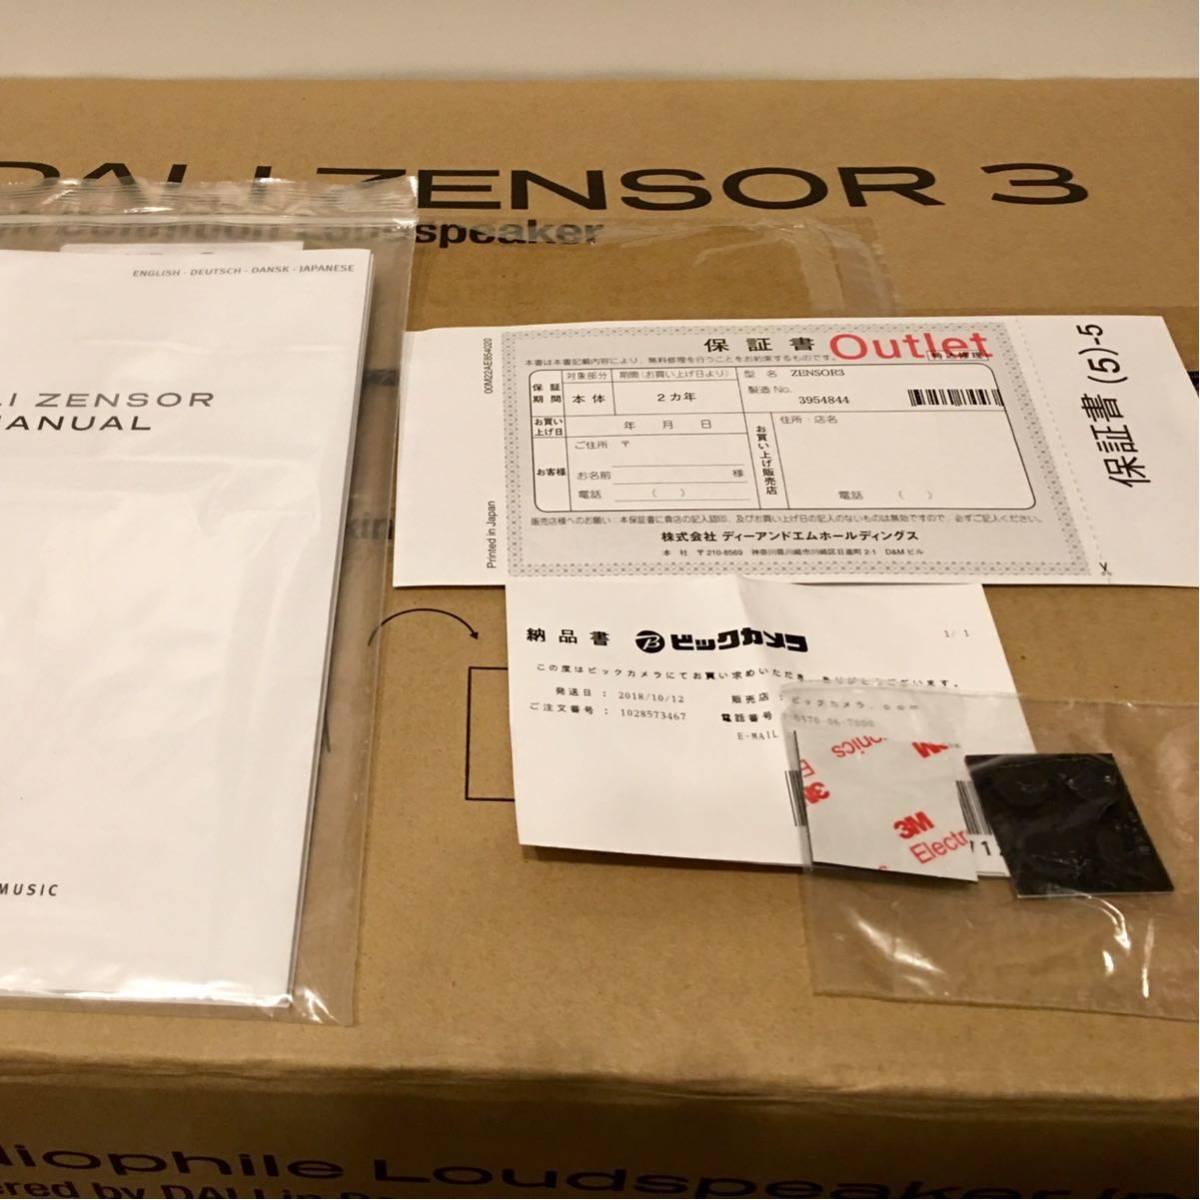 Dali Zensor3 ウォールナット ほぼ新品 2018/11購入 元箱 2年保証書付き_画像2